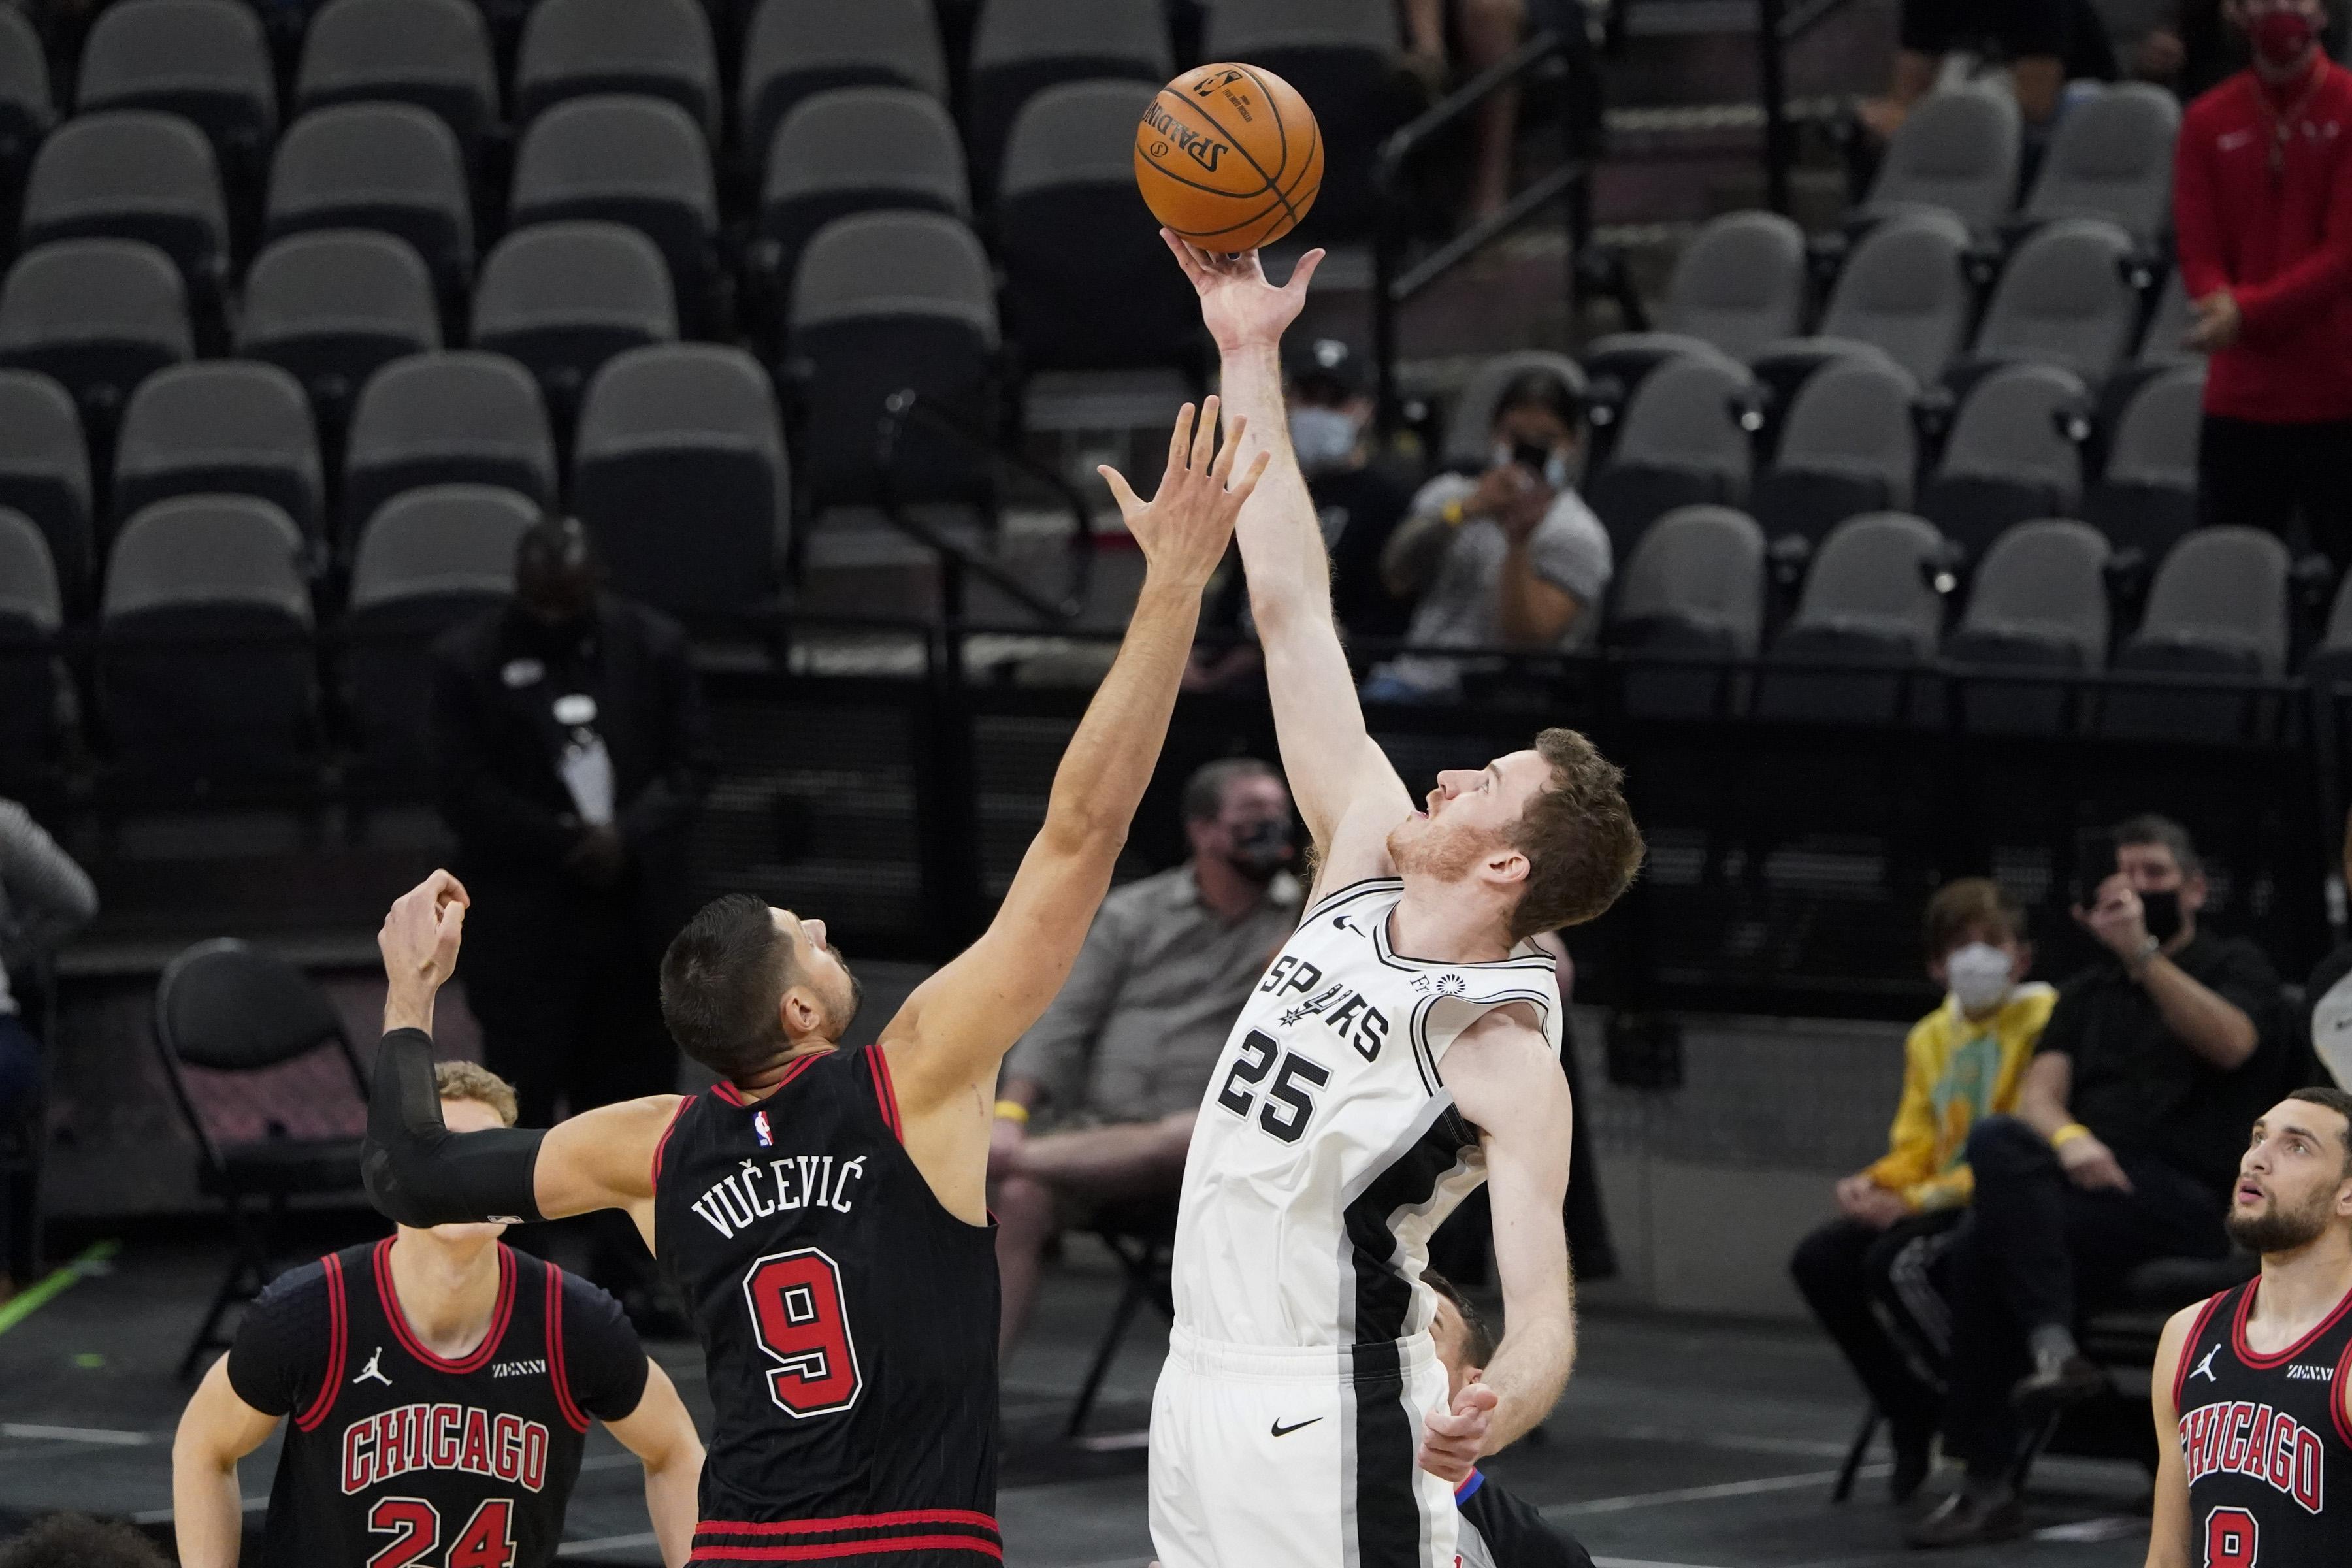 NBA: Chicago Bulls at San Antonio Spurs